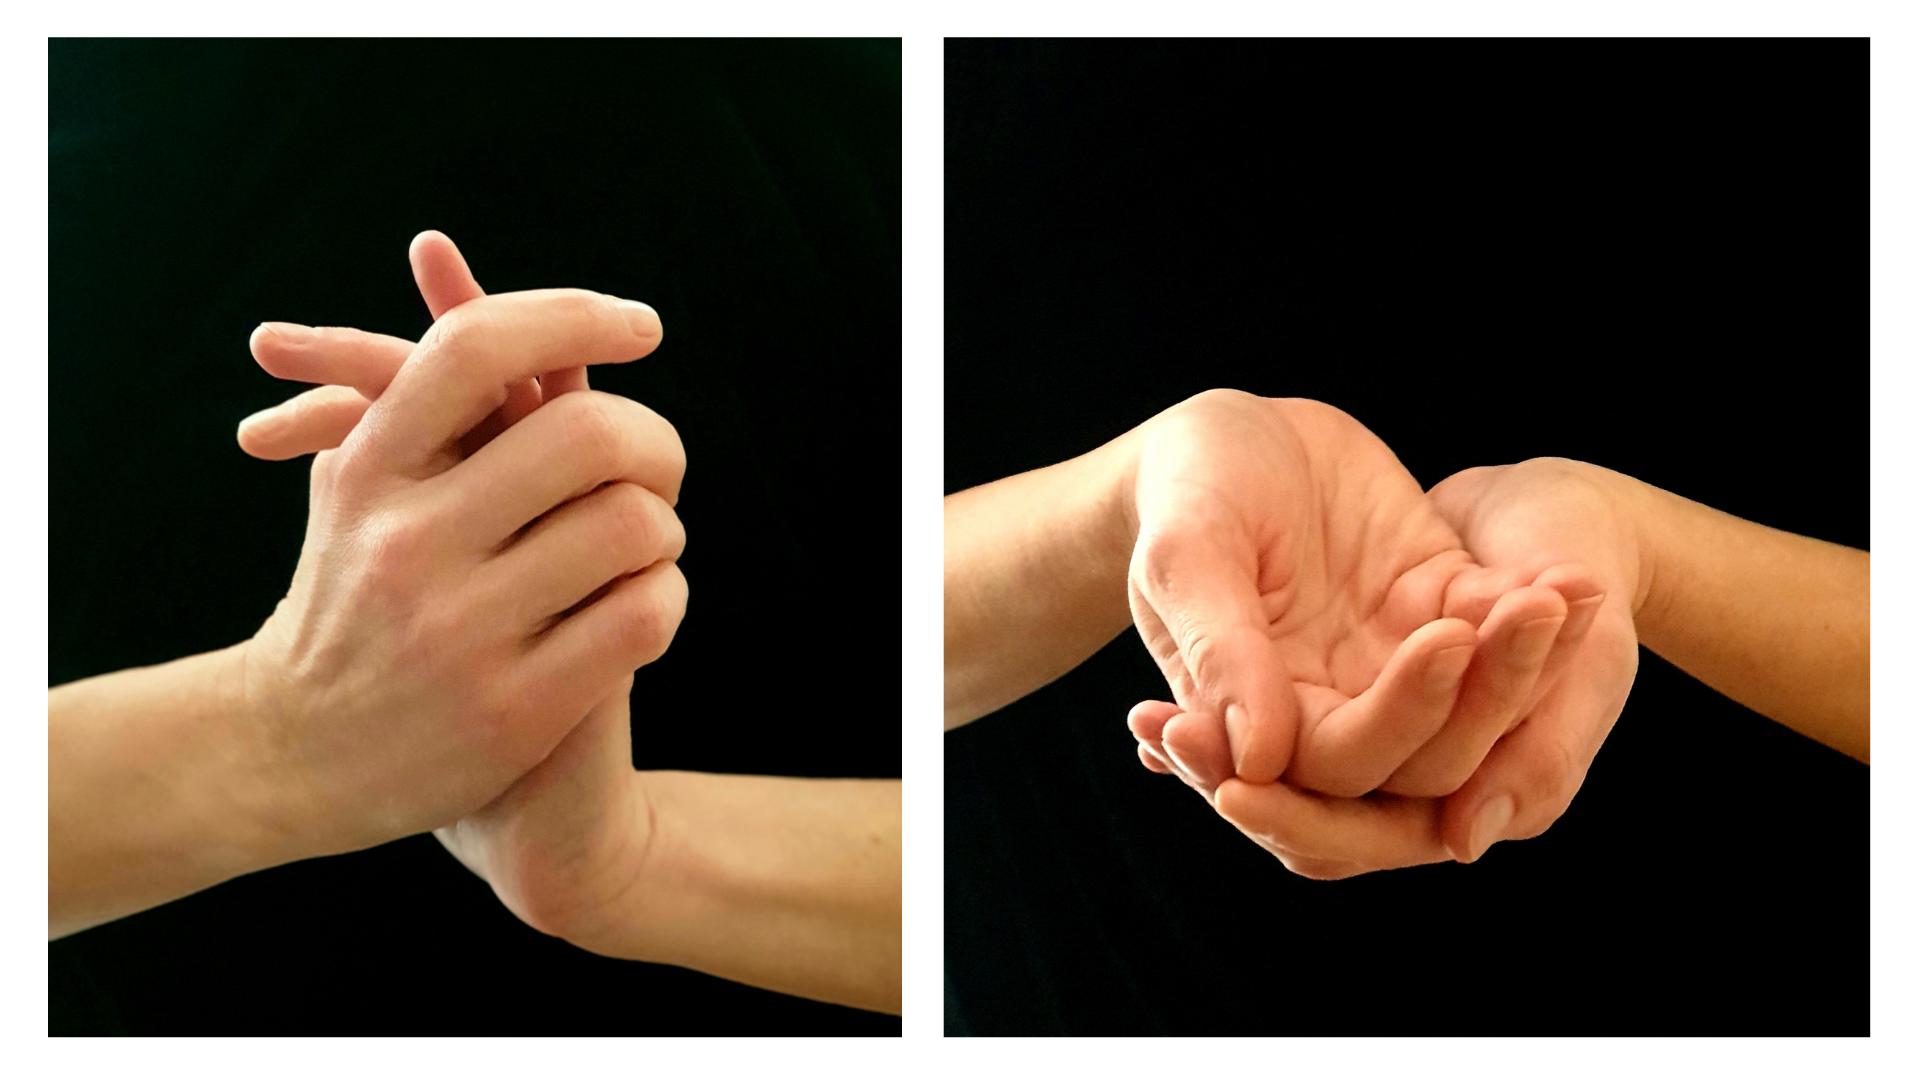 image de mains qui vont masser